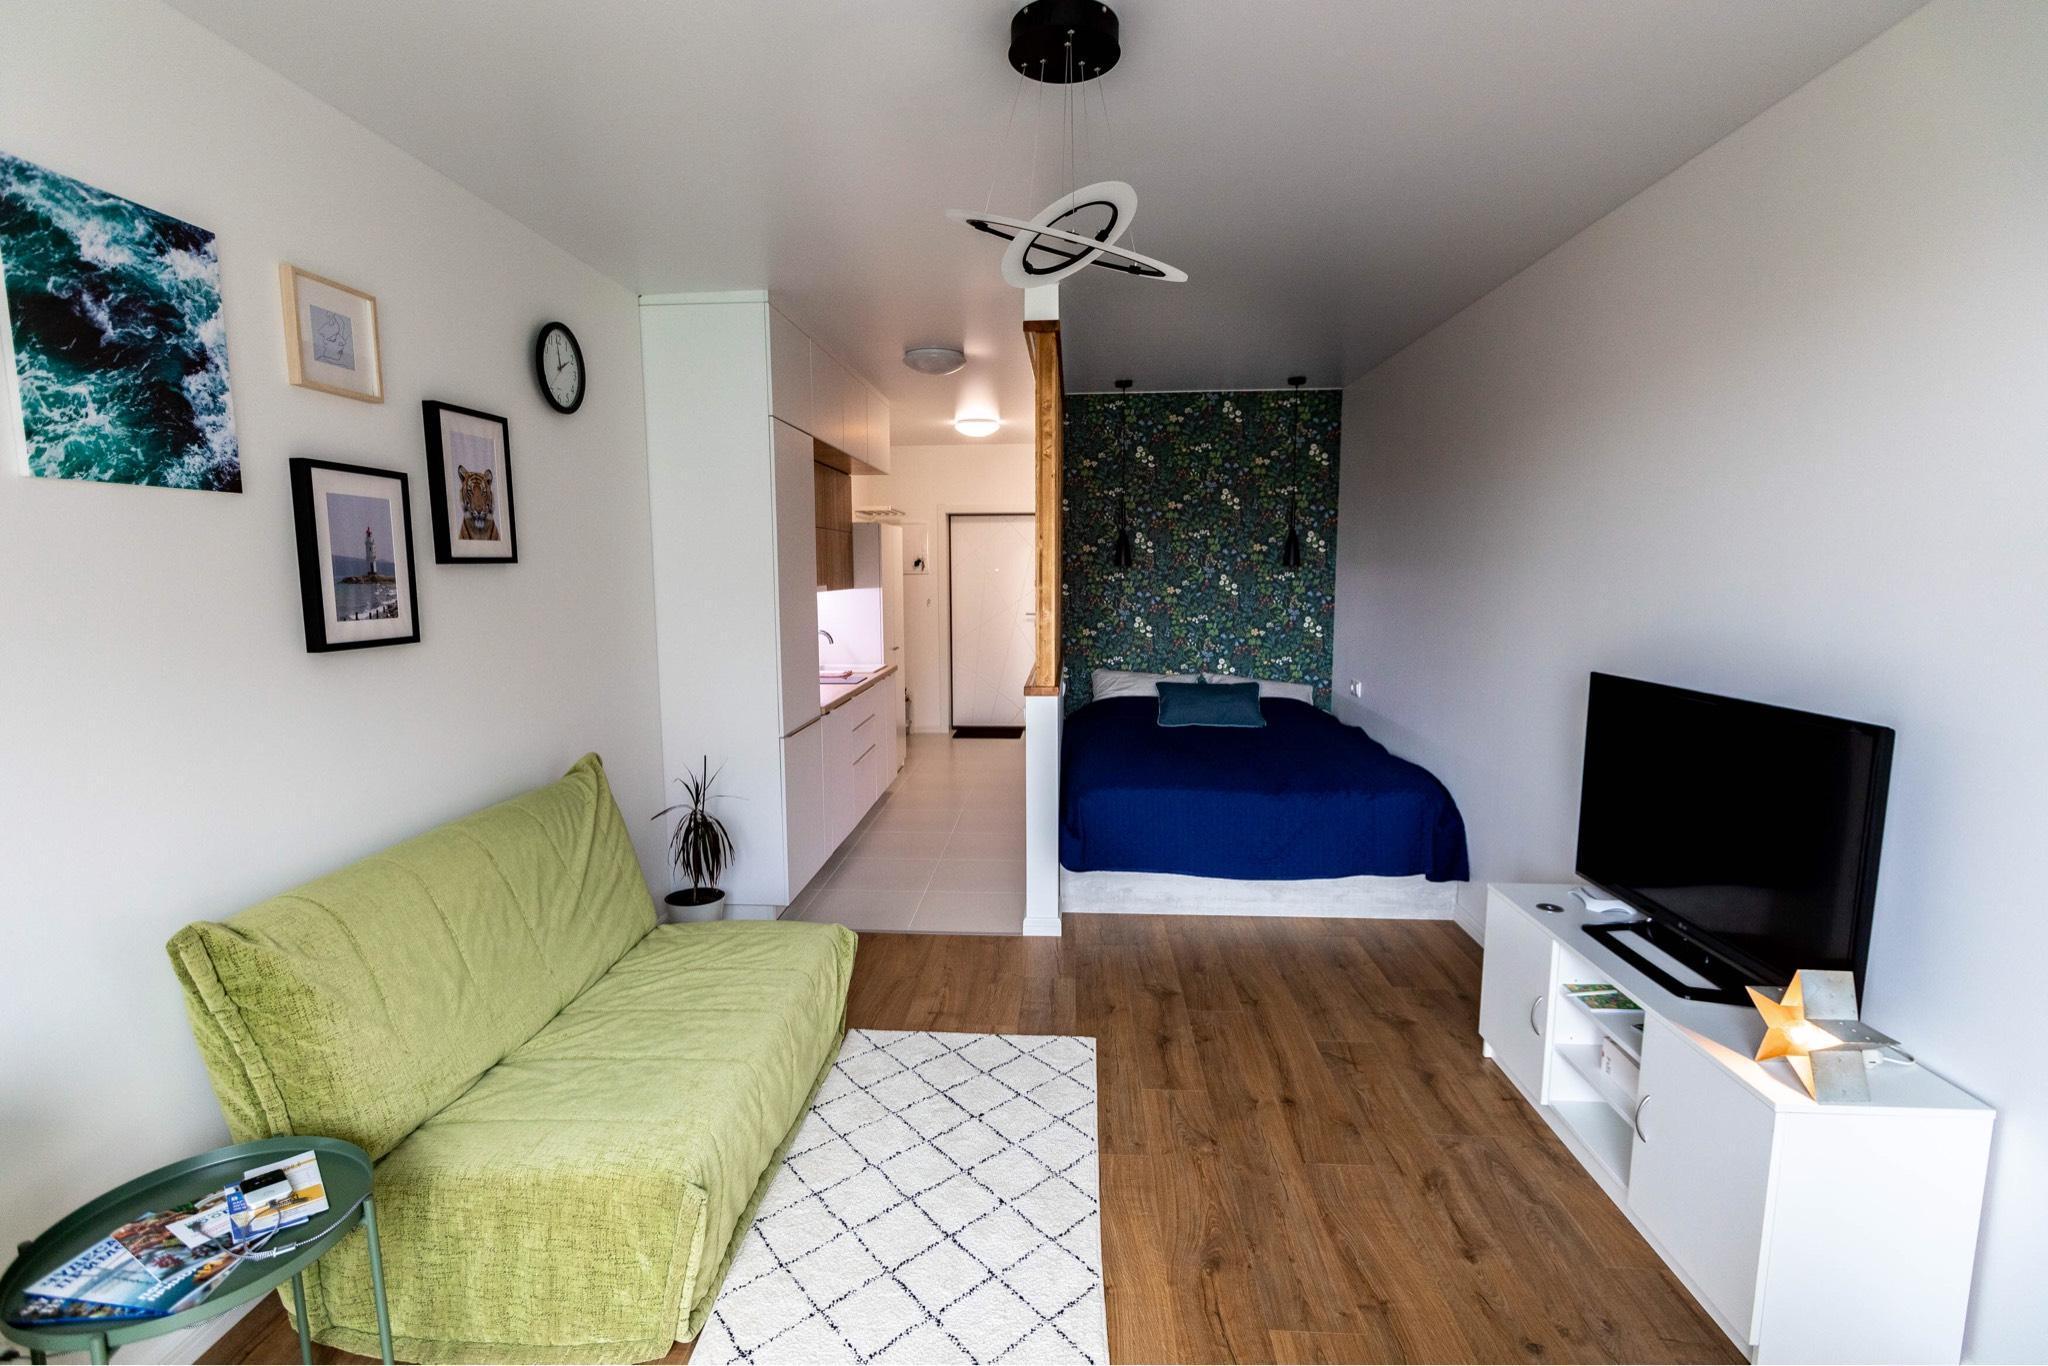 Cozy Colorful Apartment